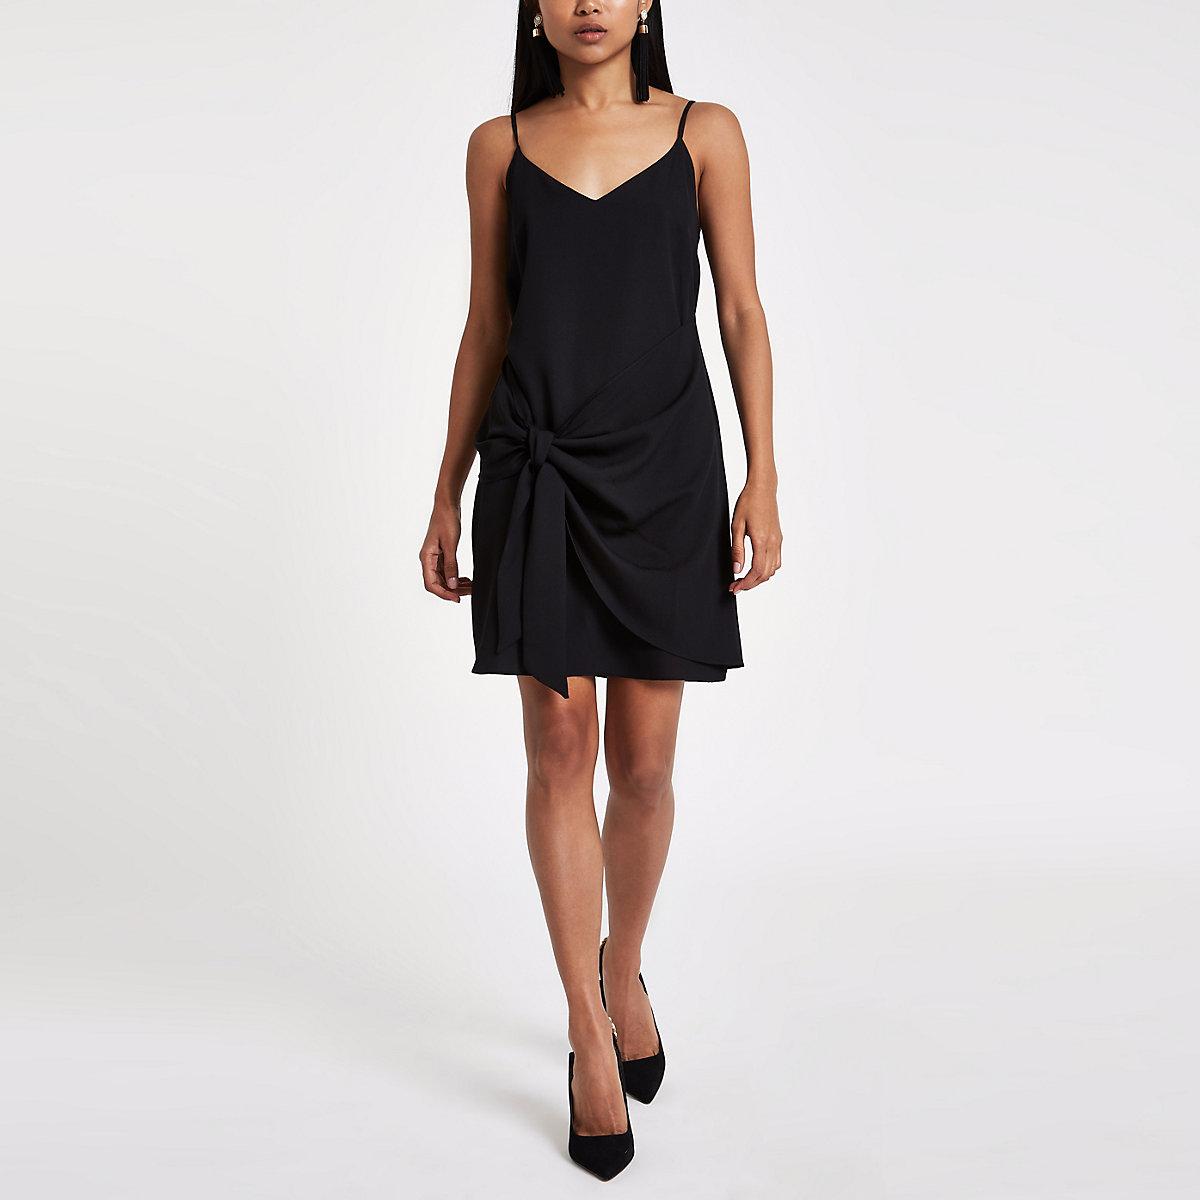 2f1ac42887 Petite black tie front cami slip dress - Slip   Cami Dresses - Dresses -  women